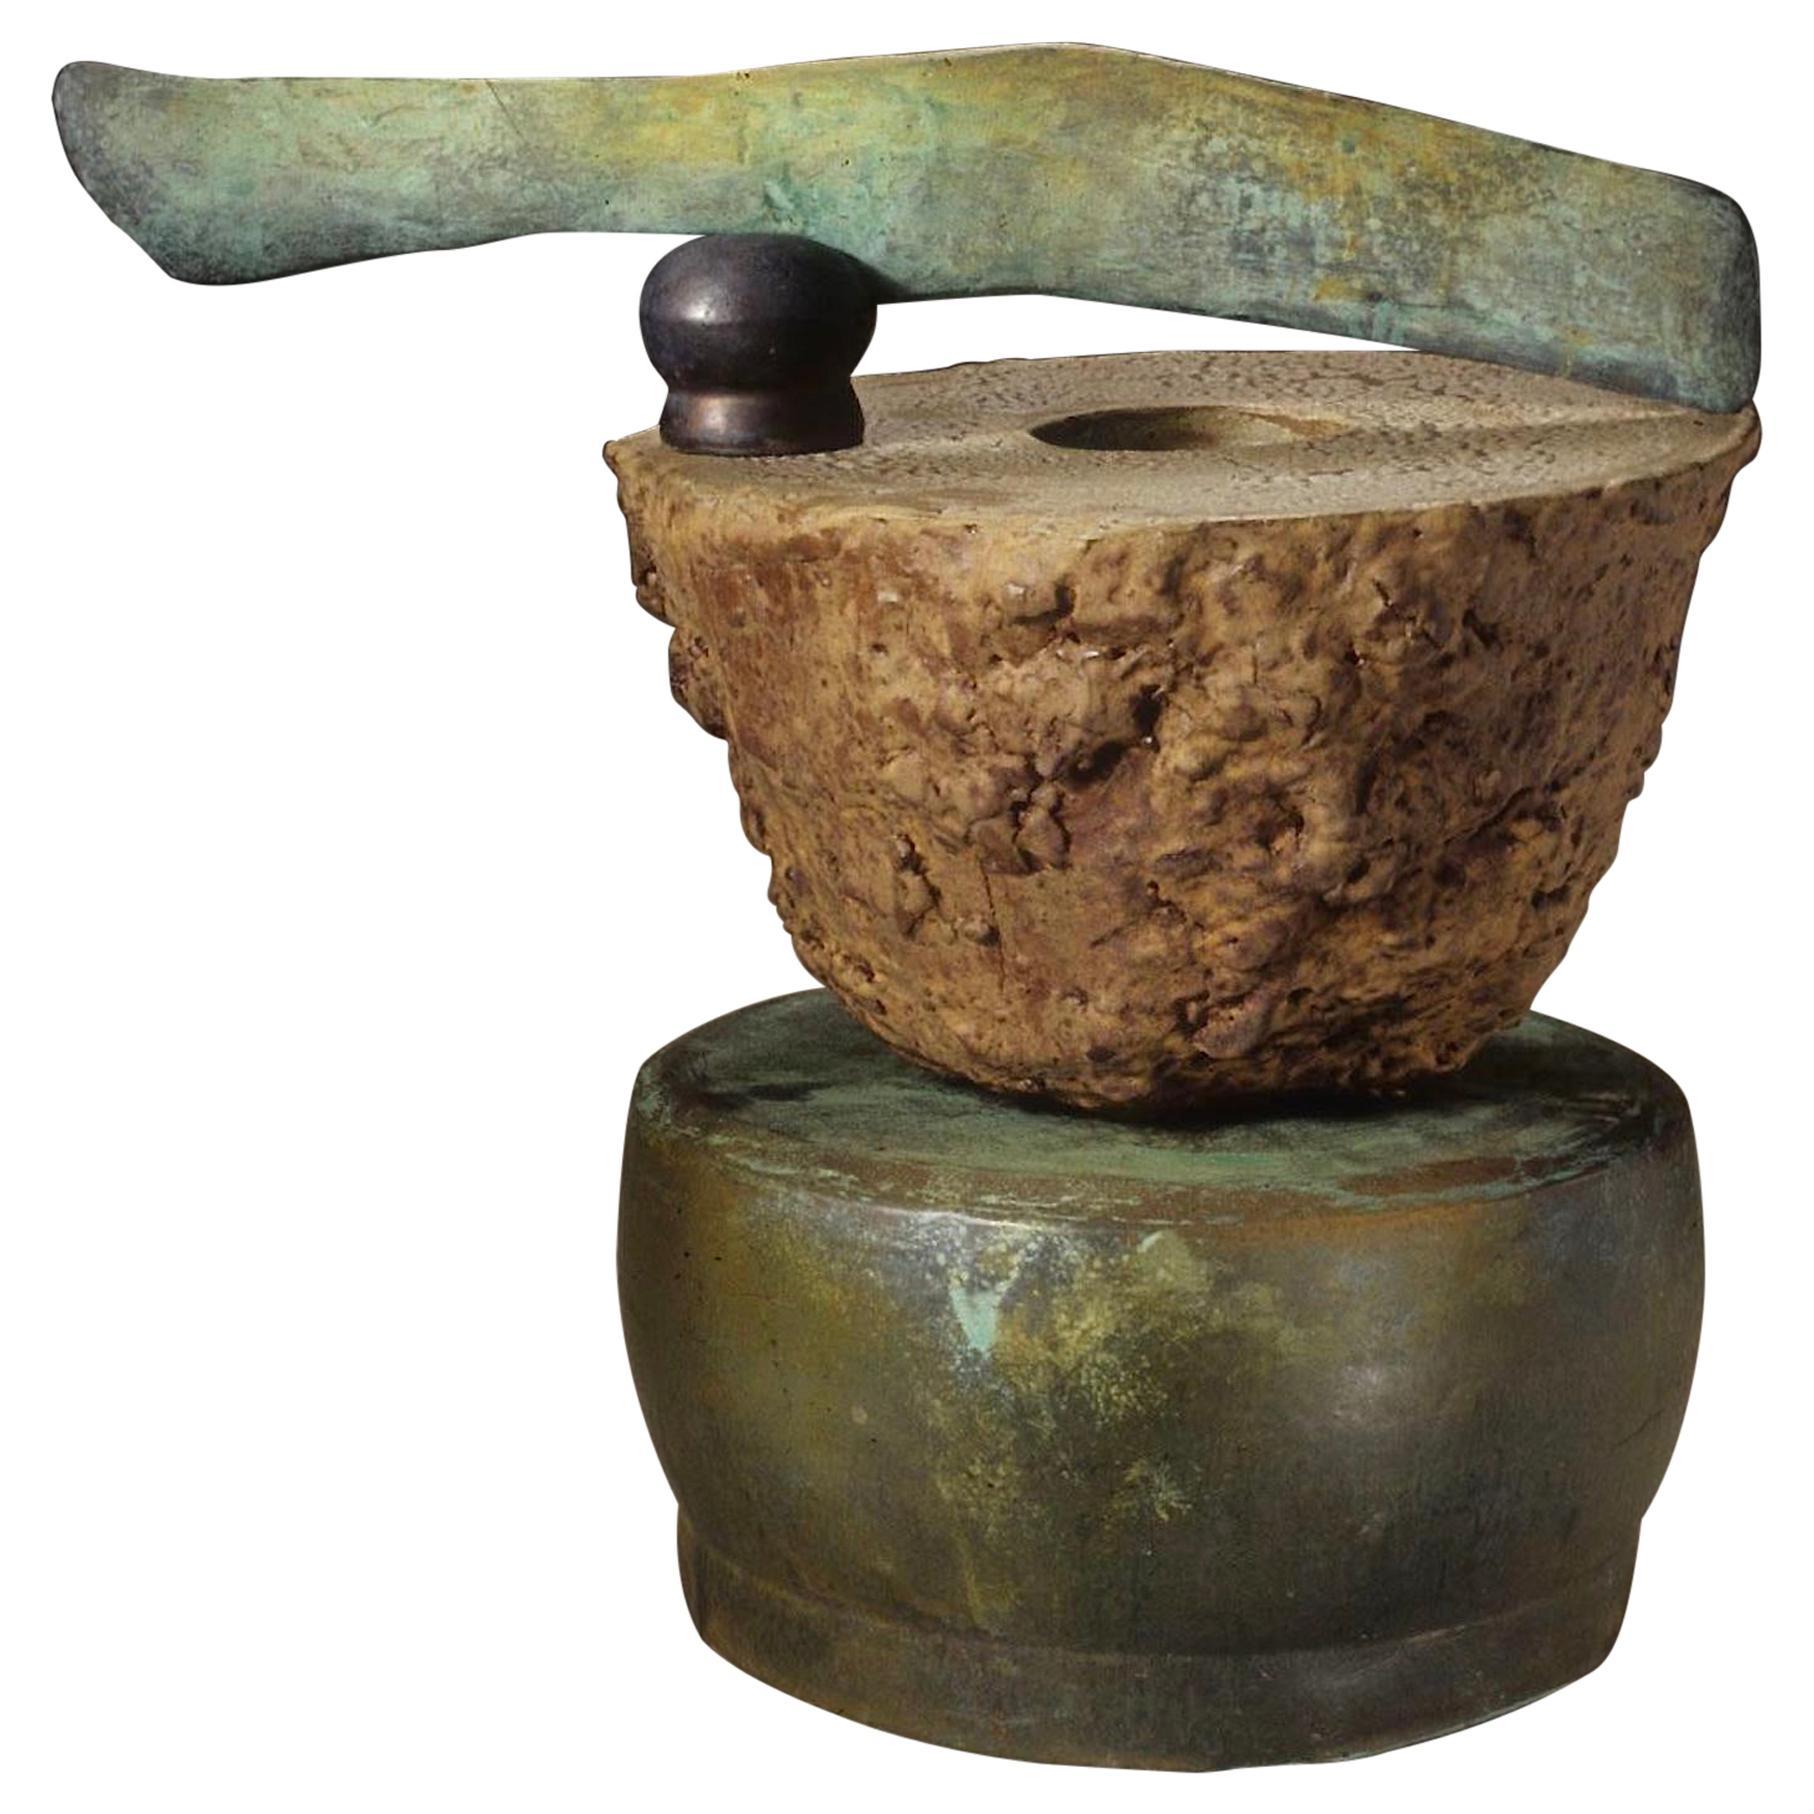 Richard Hirsch Ceramic Altar Bowl with Weapon Sculpture, 2000